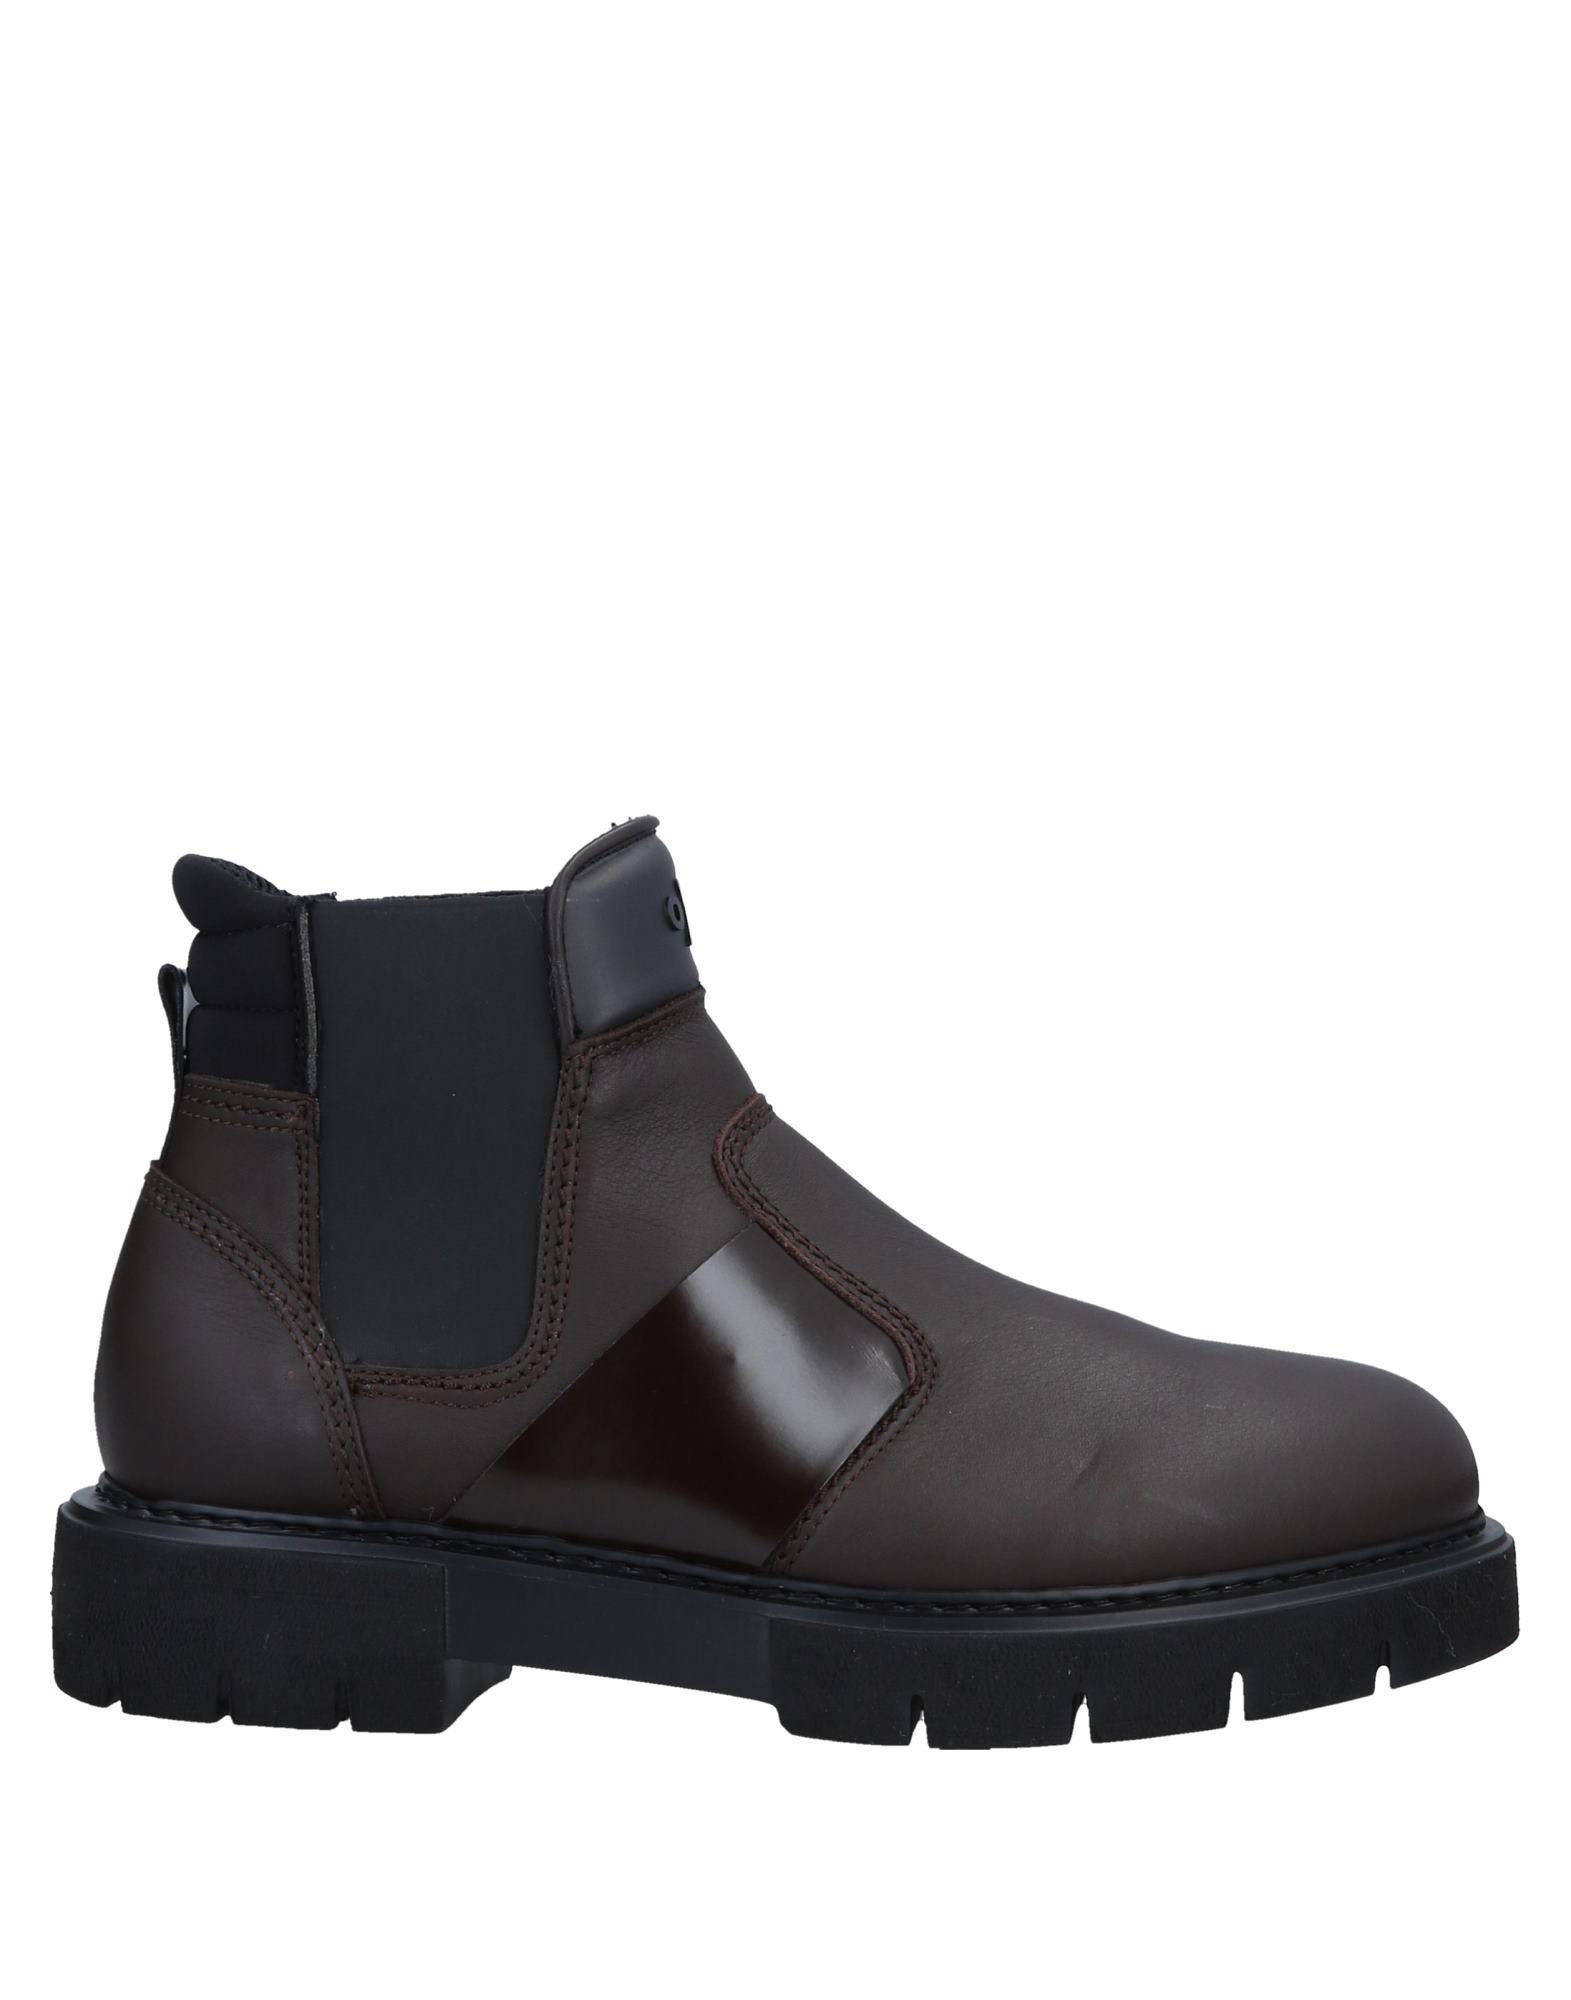 O.X.S. Boots - Men Men Men O.X.S. Boots online on  United Kingdom - 11573822VS 594e31